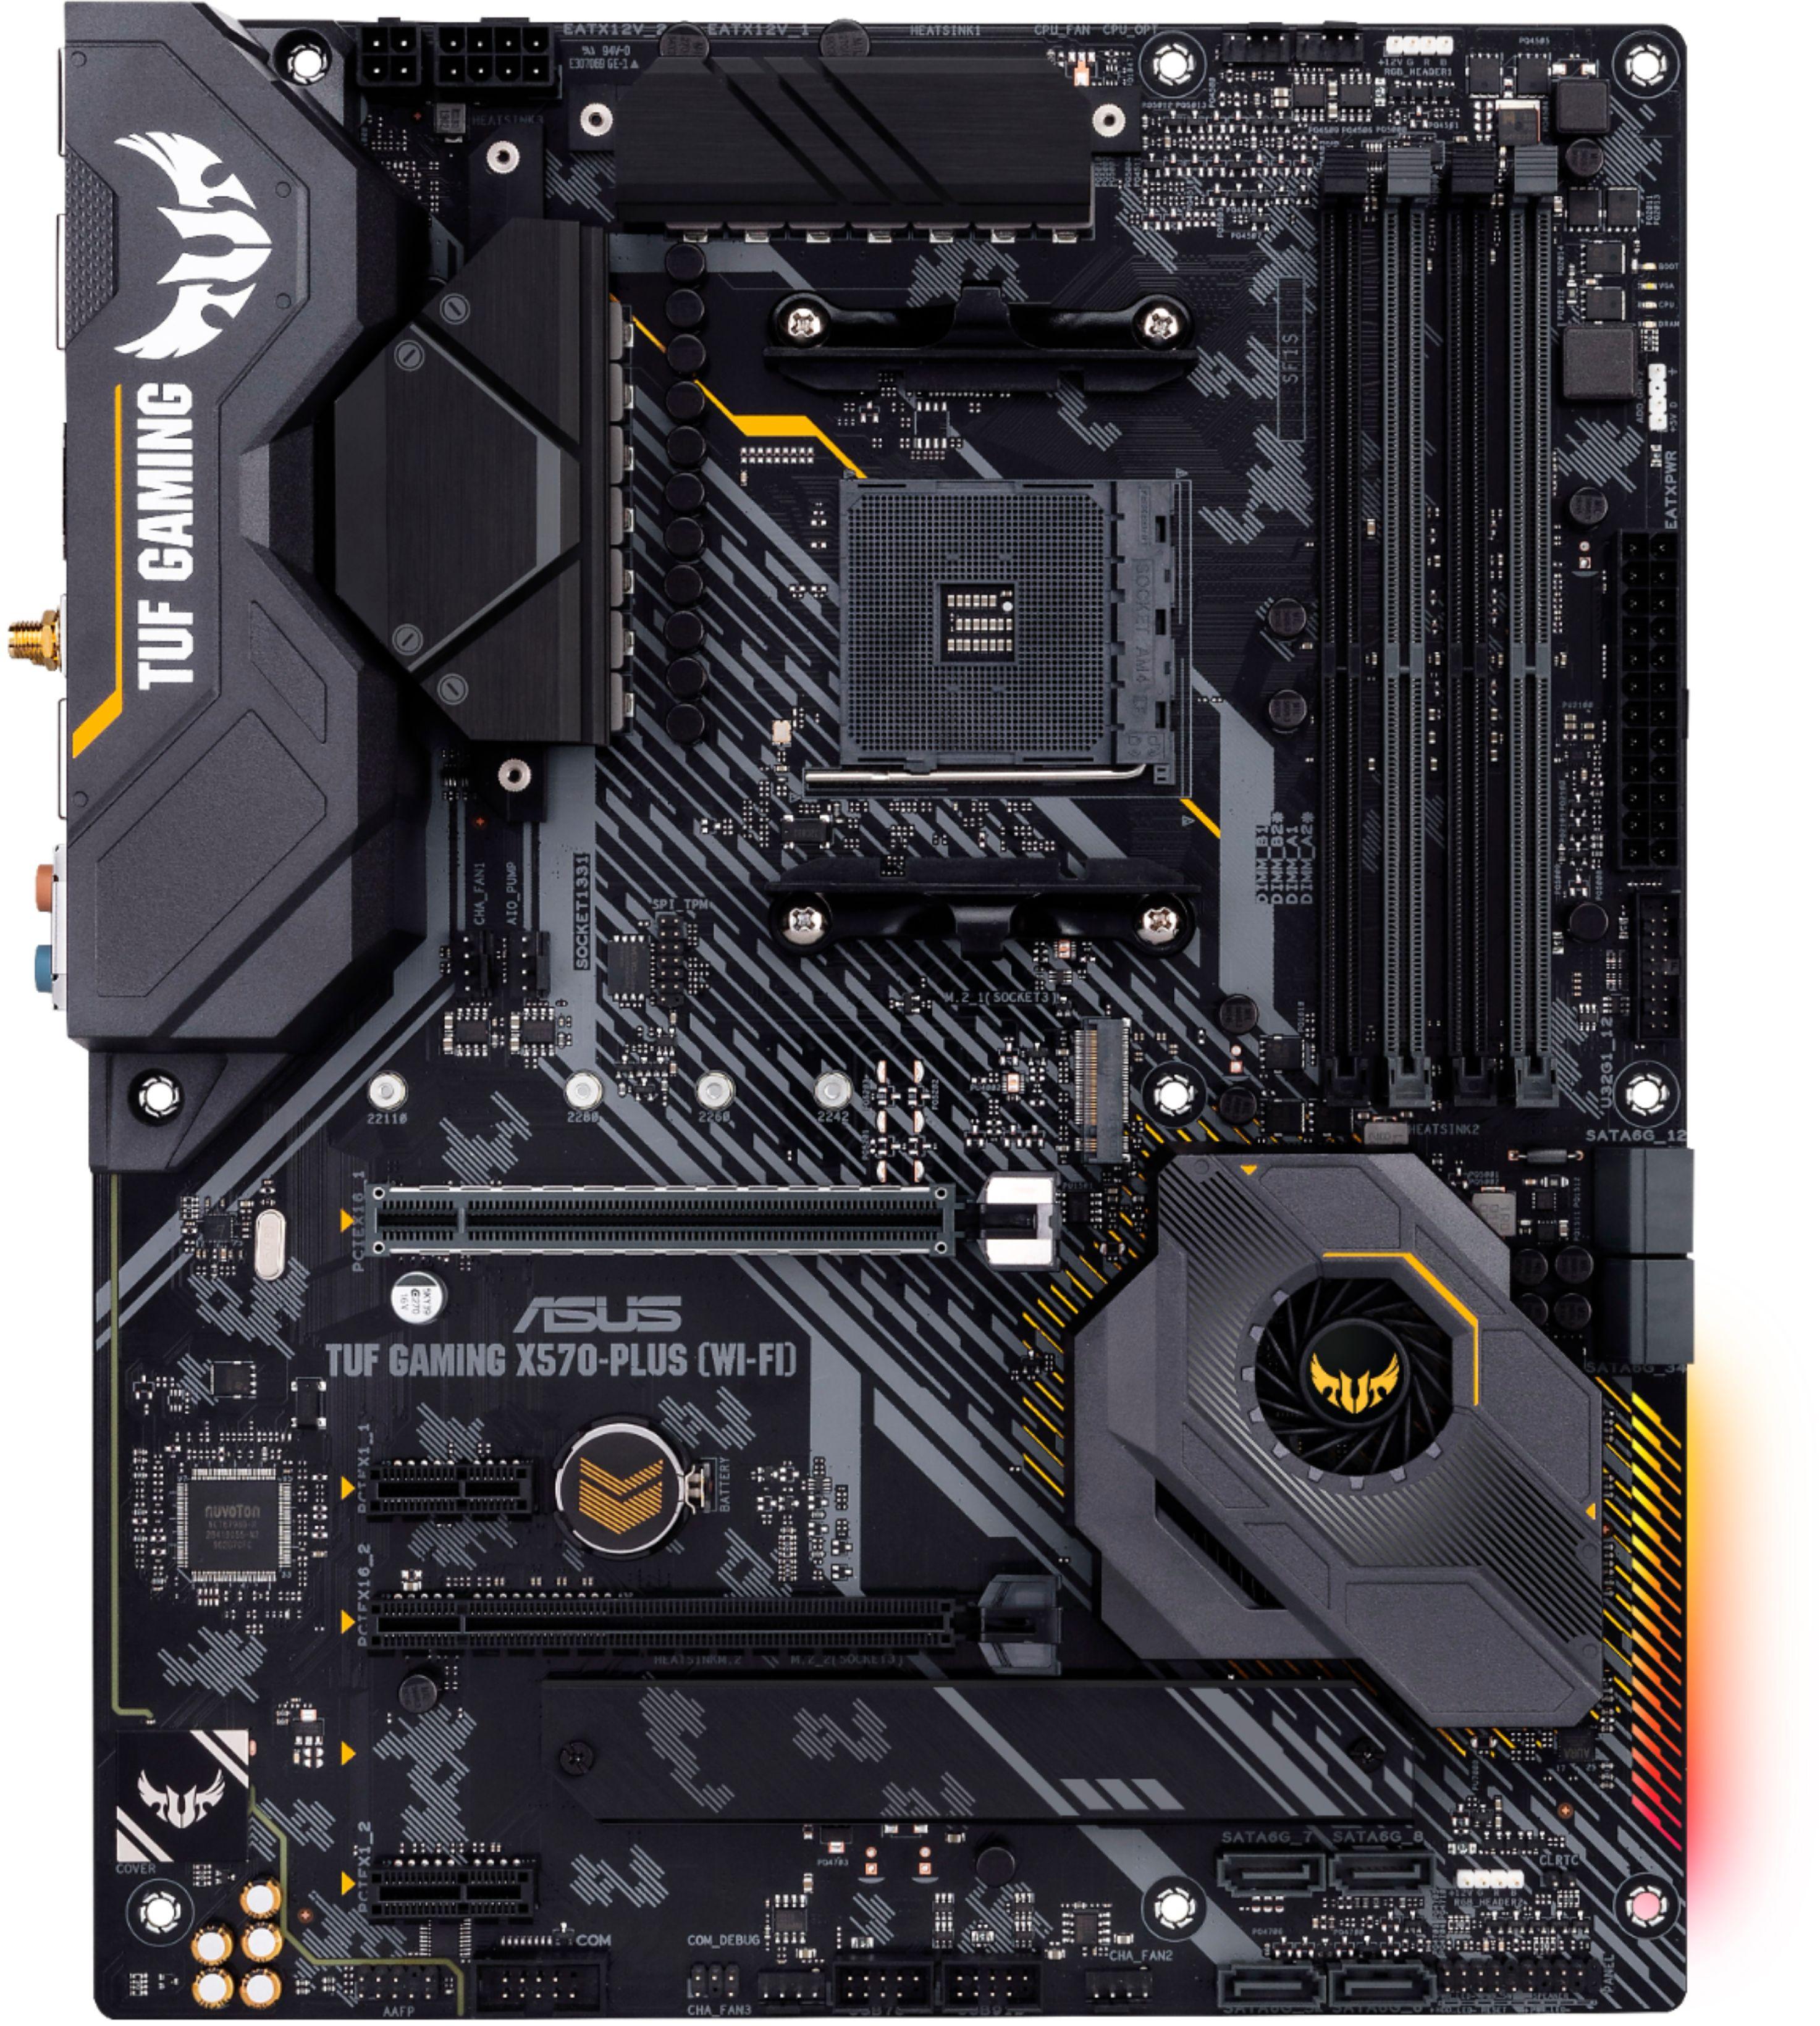 New Budget Gaming PC build - AMD 3600X CPU + ASUS TUF Gaming X570 Plus WiFI + G.Skill 16G = $480.00